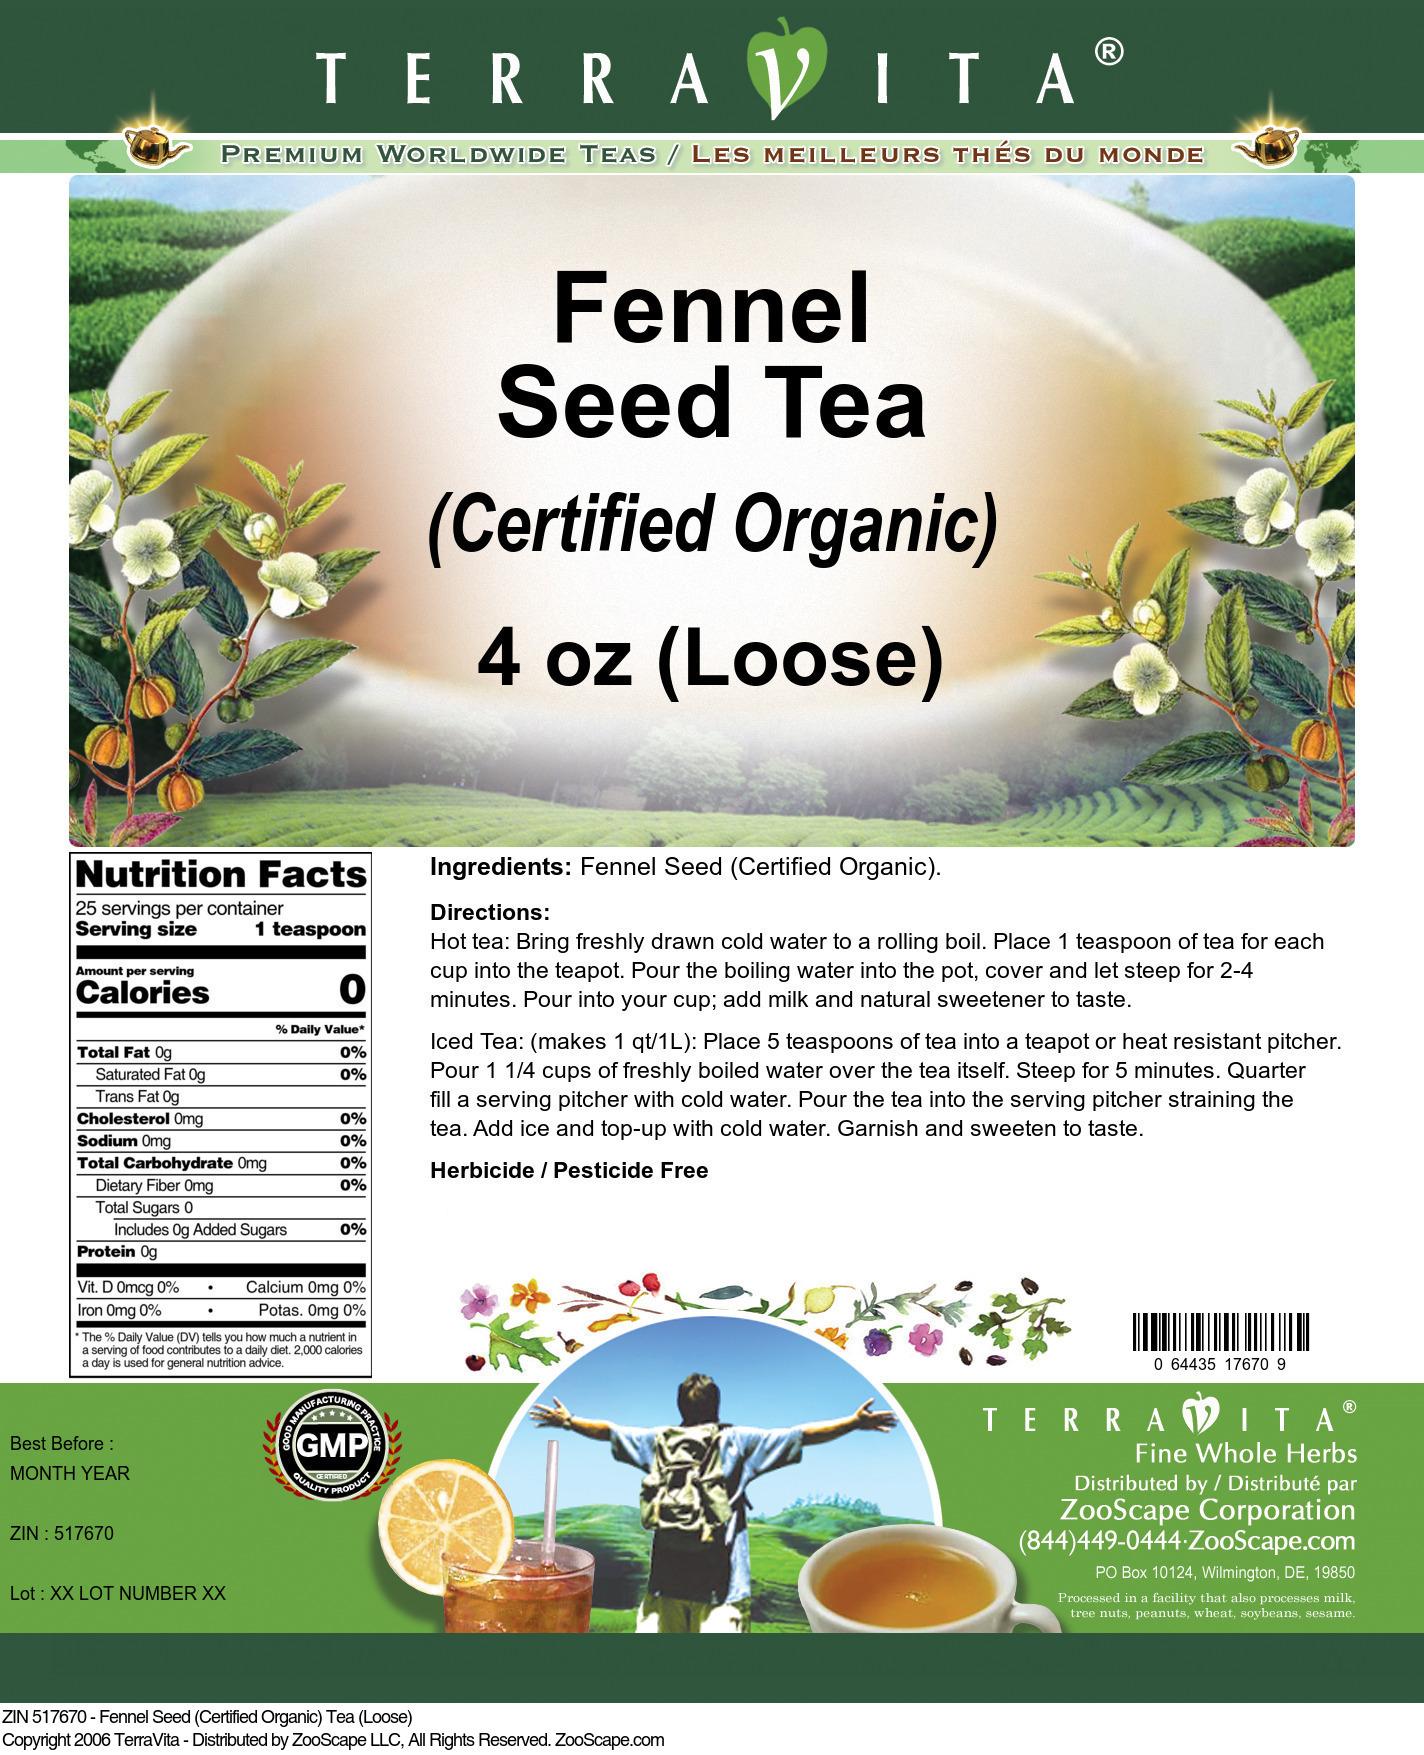 Fennel Seed (Certified Organic) Tea (Loose)